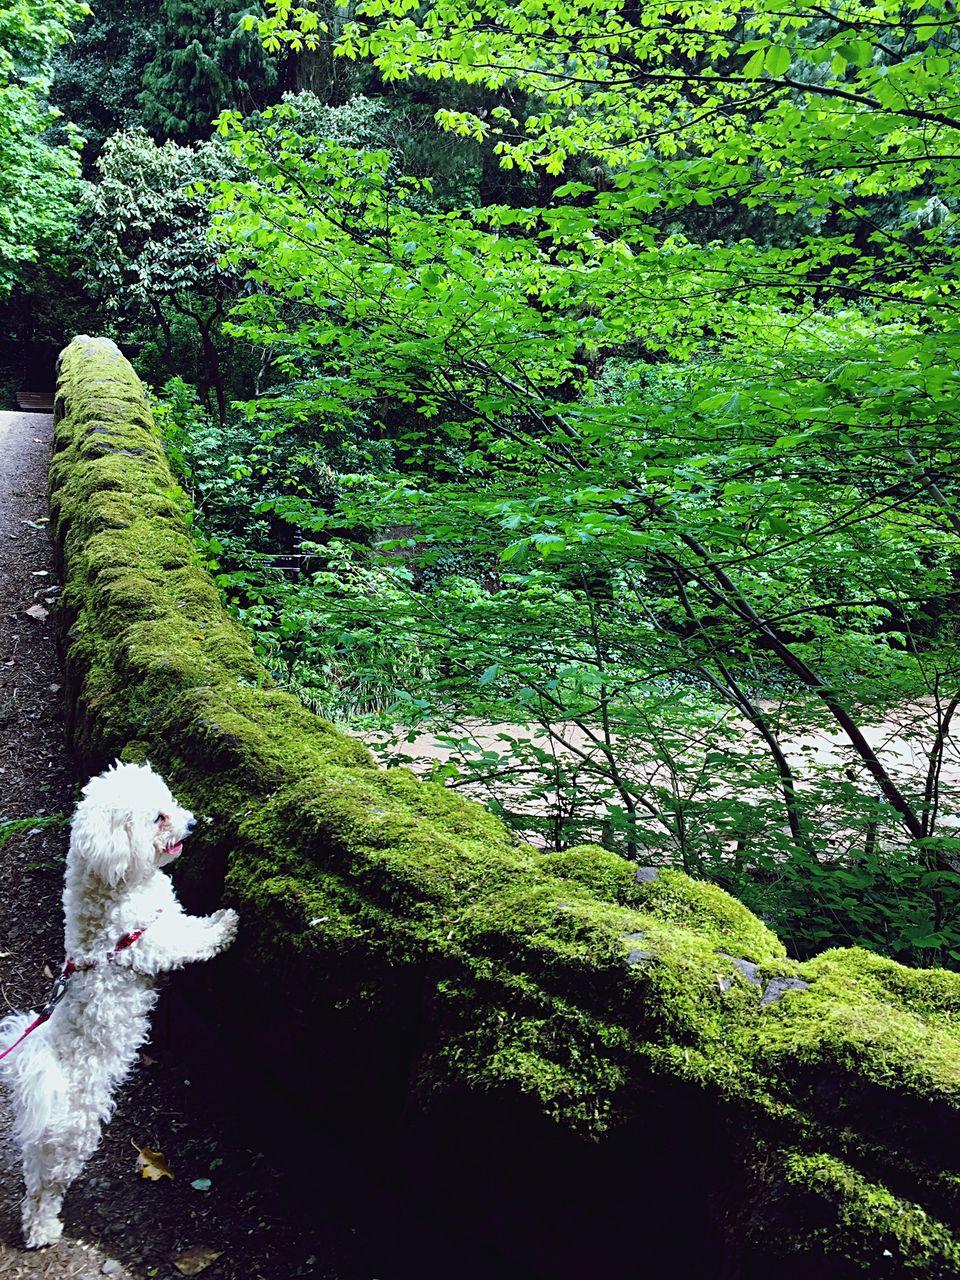 Bichon Frise Dog On Stone Bridge Covered With Moss